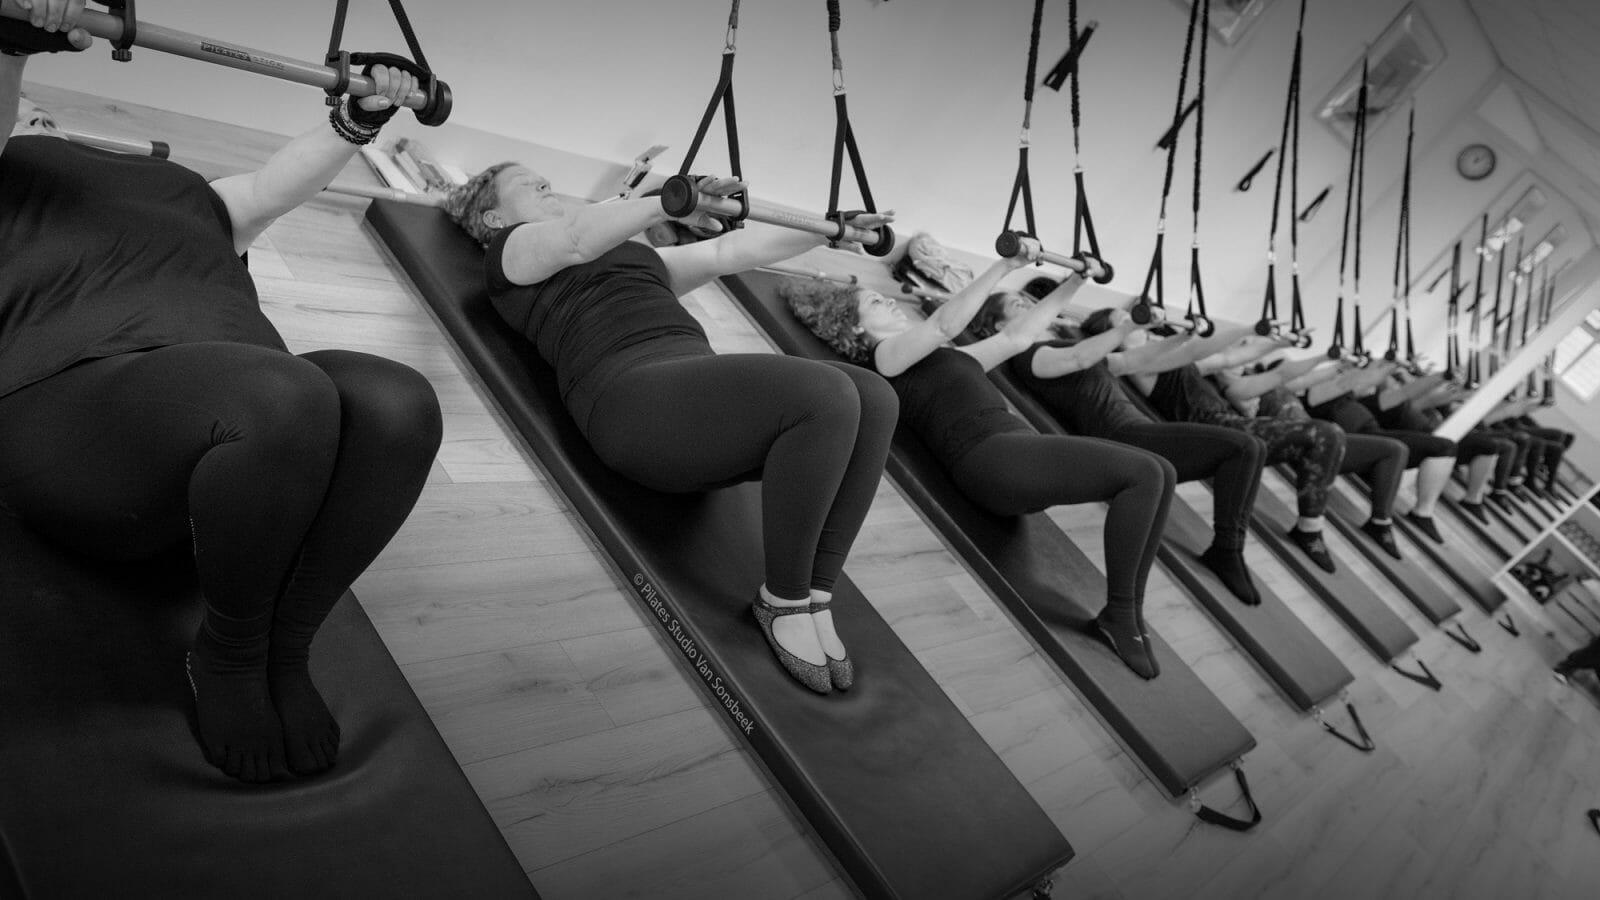 Pilatesstick connectie armen-ribbenkast-rug.